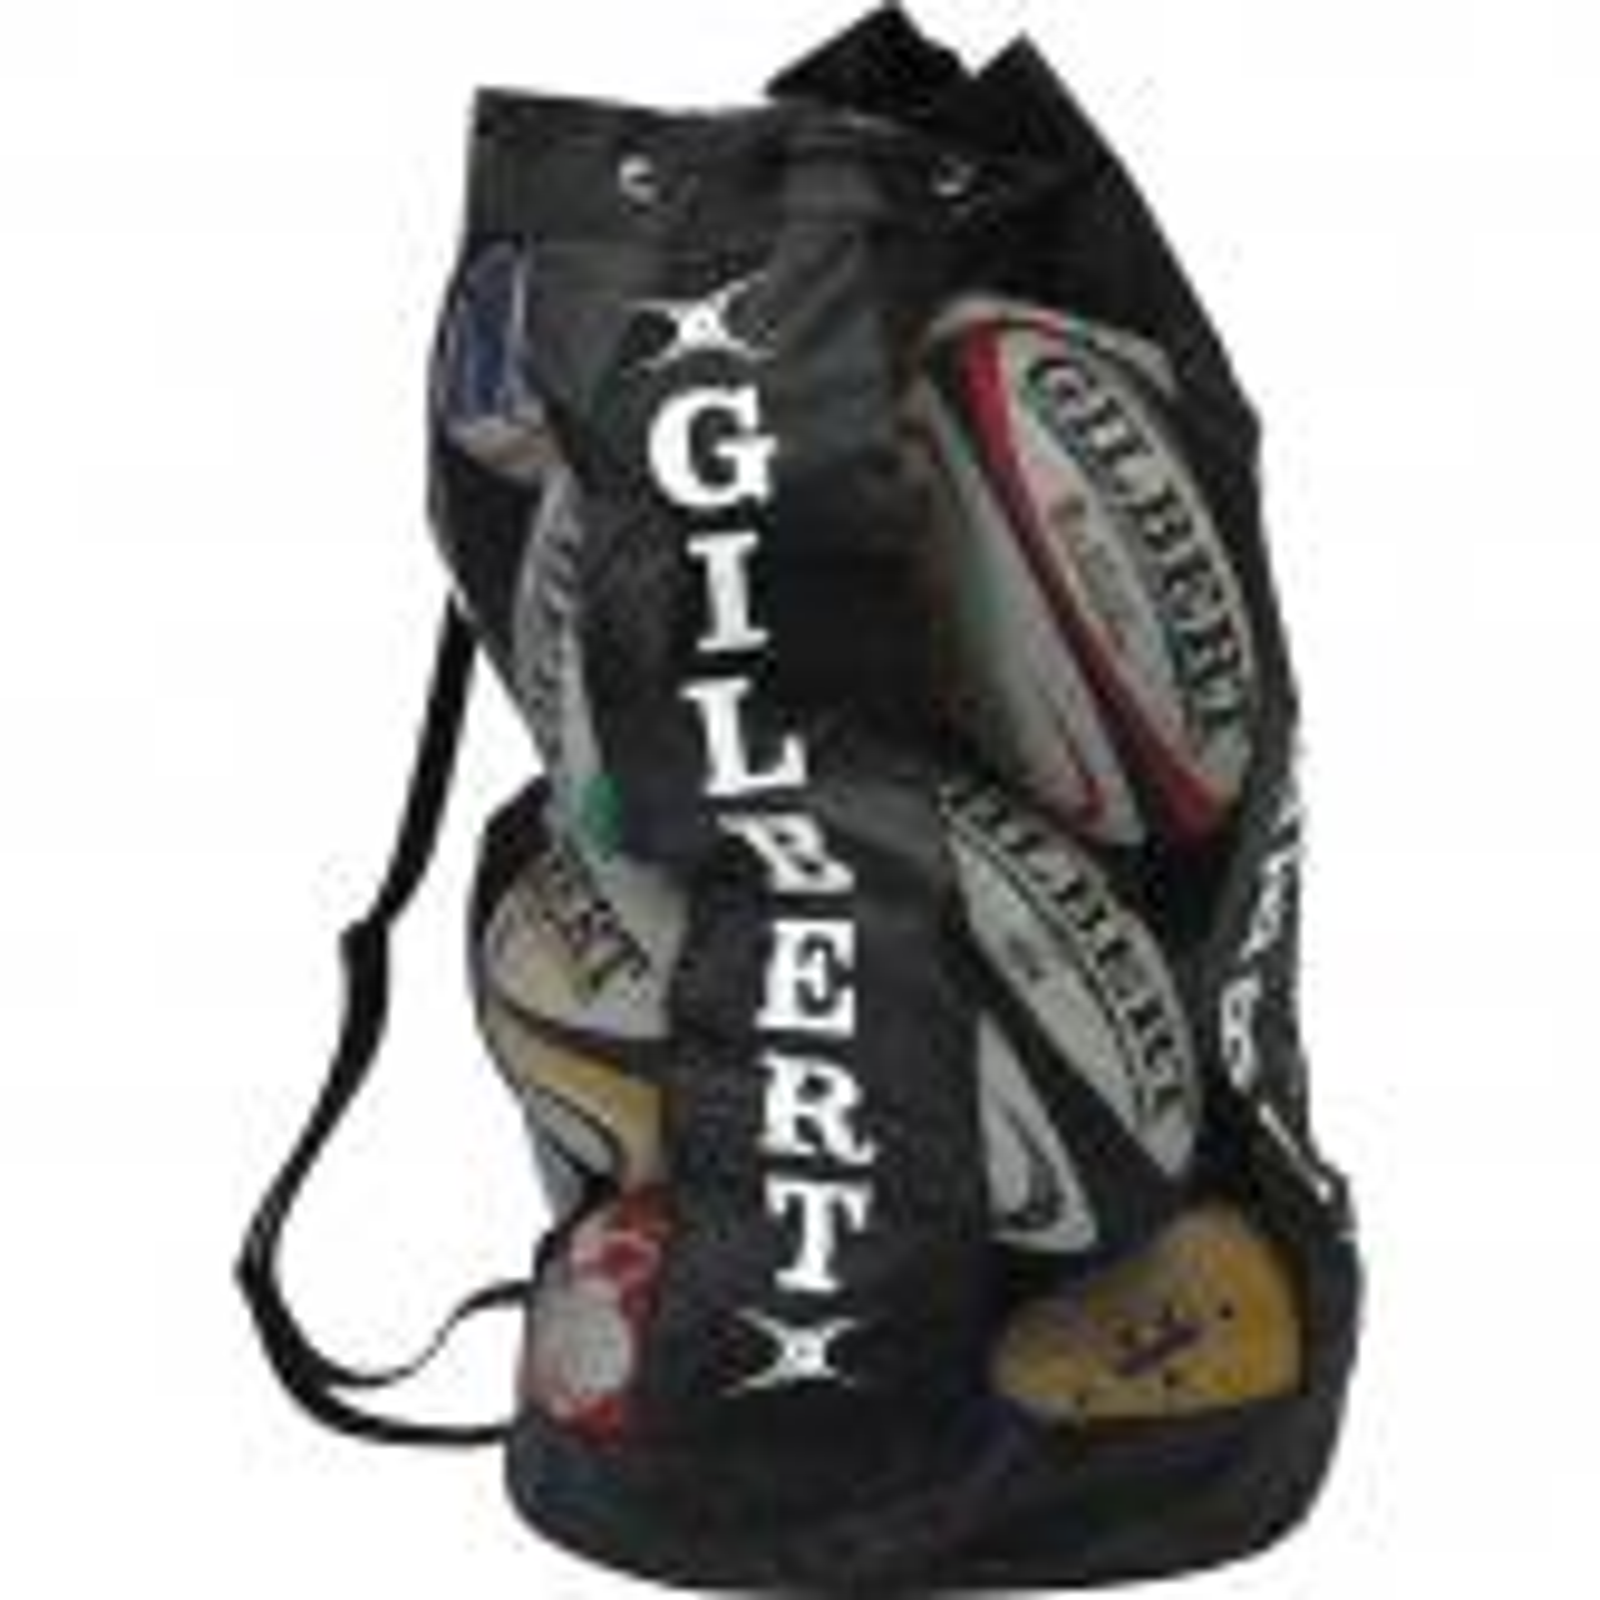 Kit Bags and Ball Bags